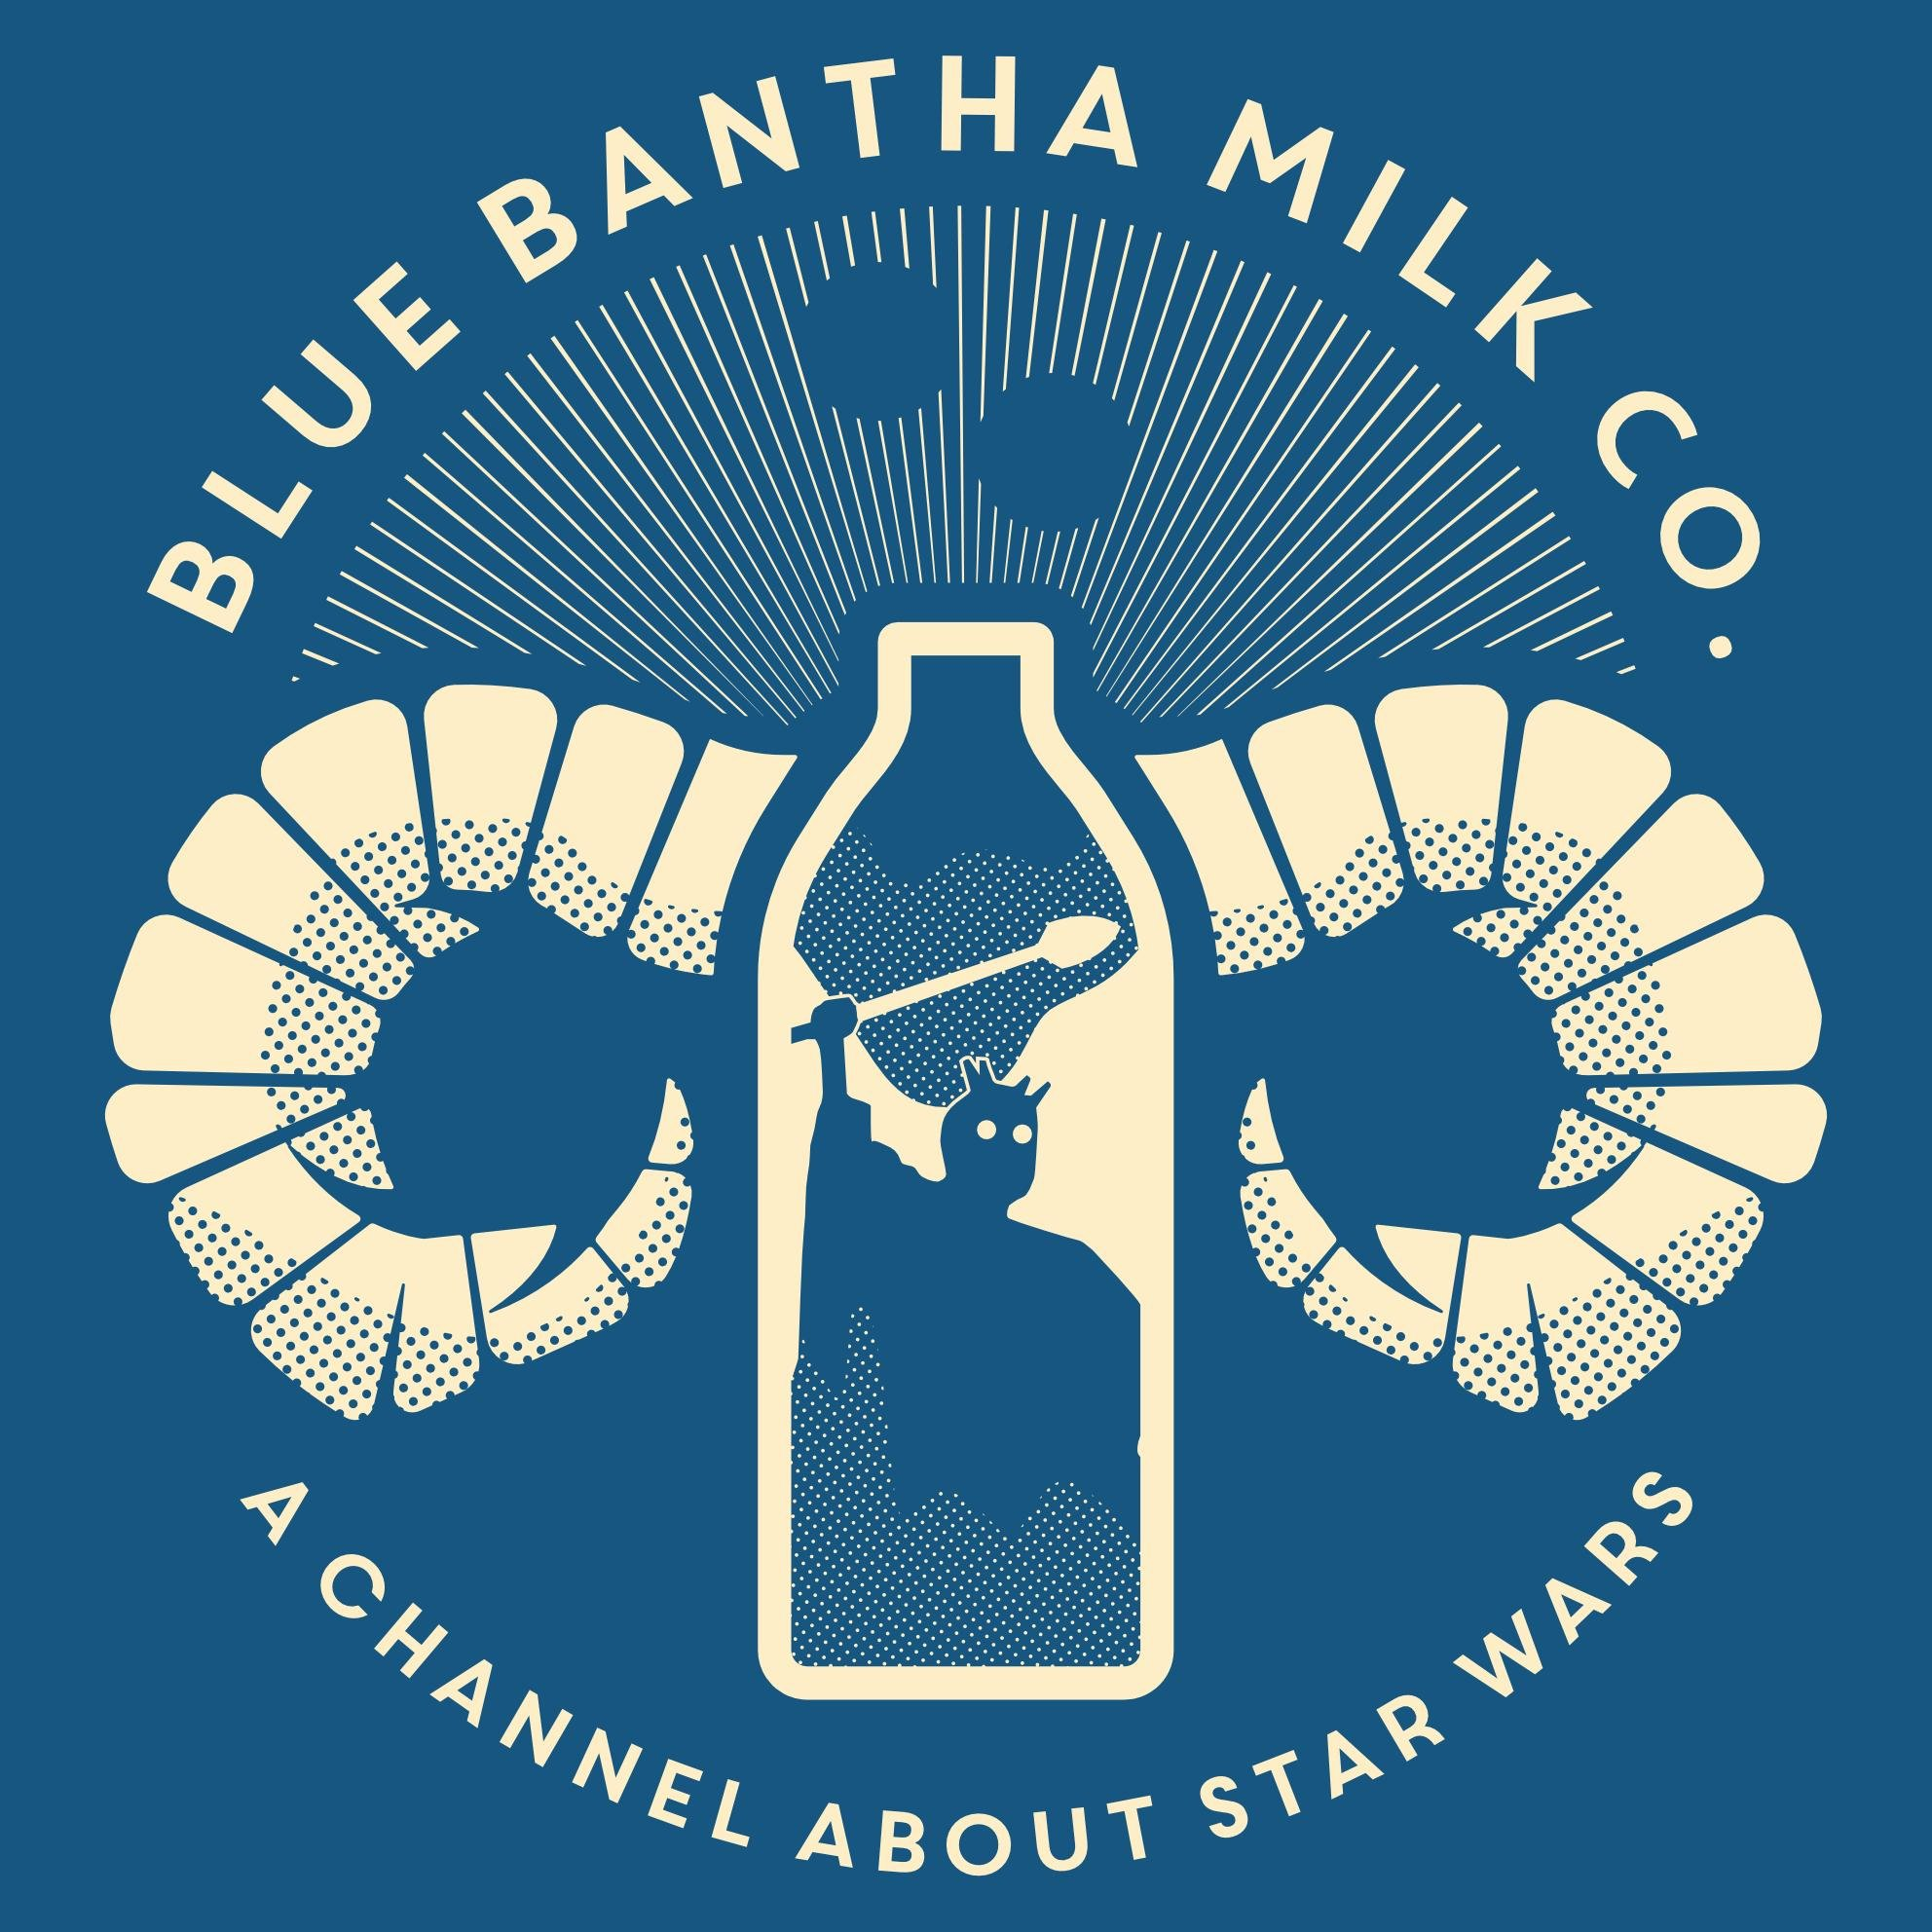 Blue Bantha Milk Co. on YouTube ▶️